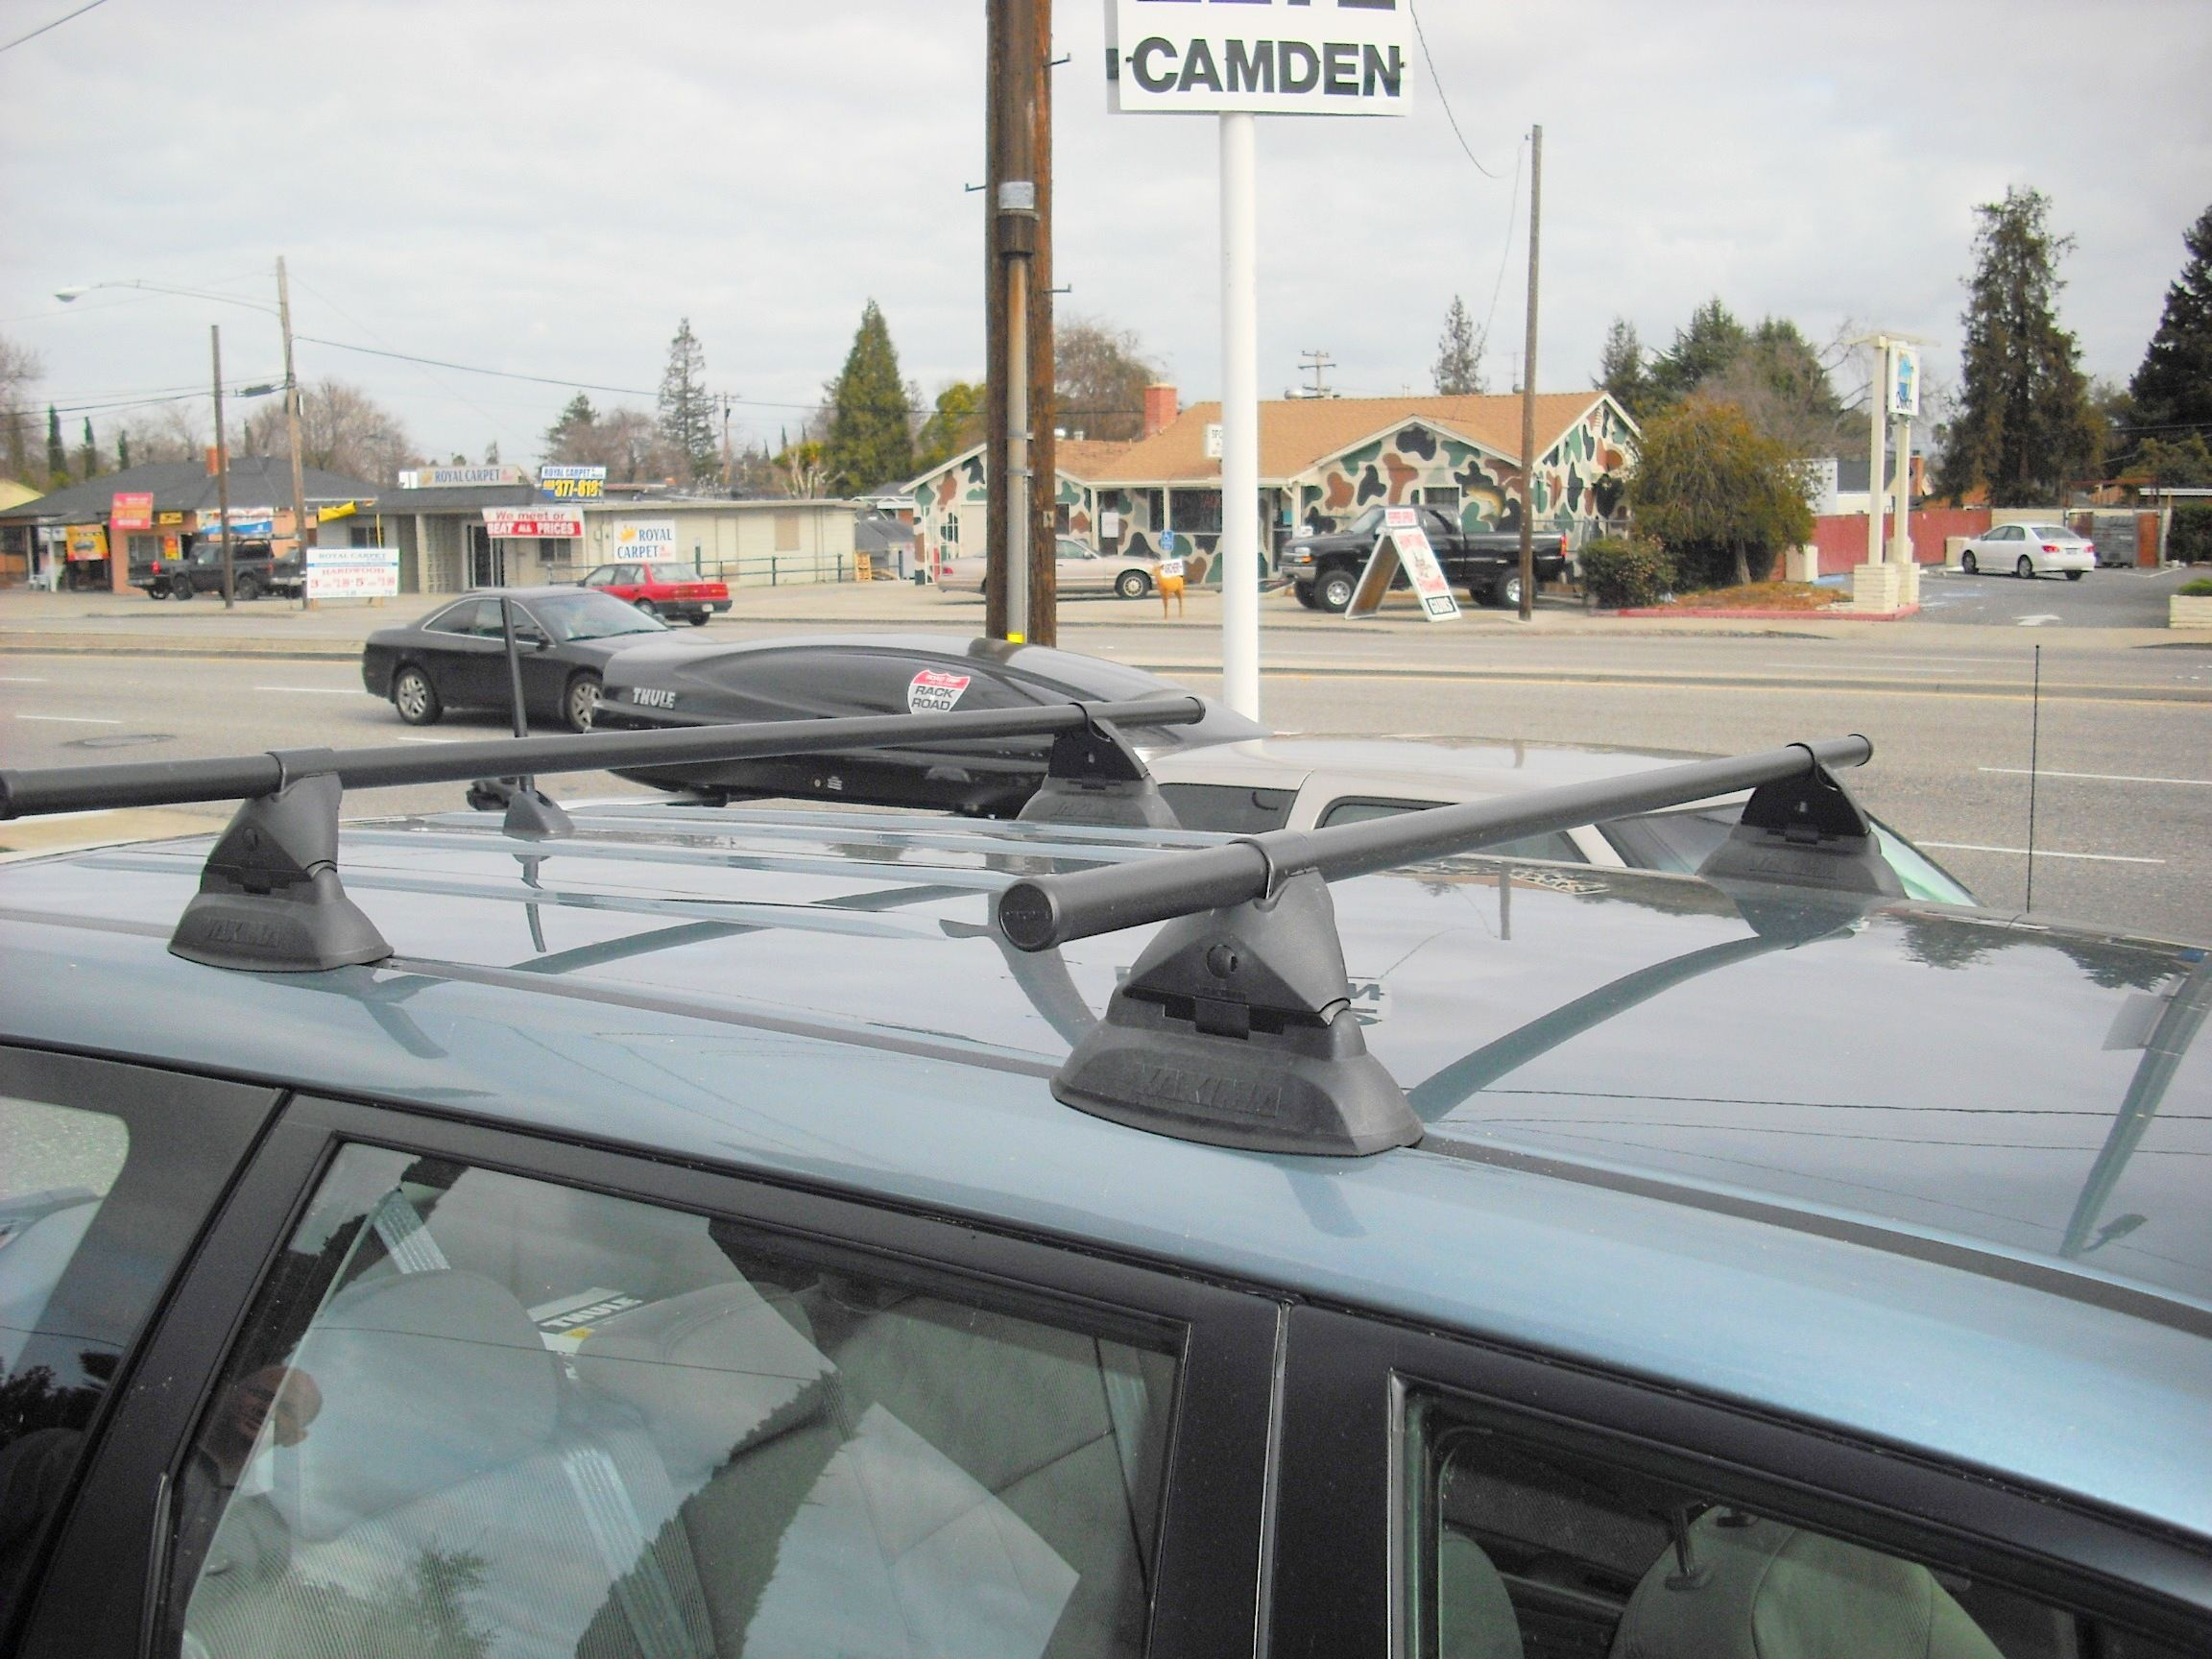 Subaru Forester Featuring A Yakima Control Tower Car Racks Car Roof Racks Bike Trailer Hitch